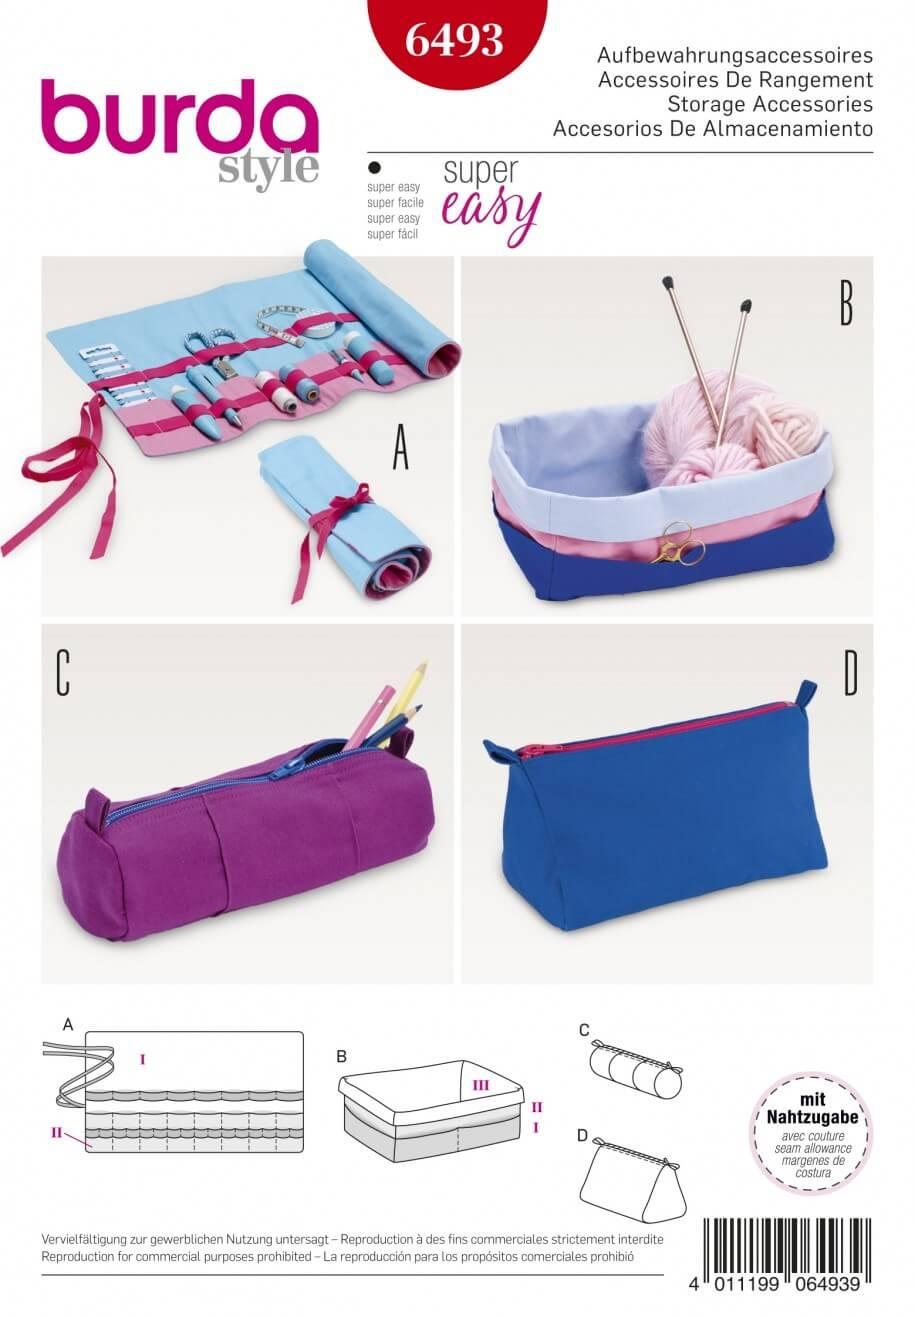 Burda Style Storage Accessories Roll Up Bag Pencil Case Box Sewing Pattern 6493